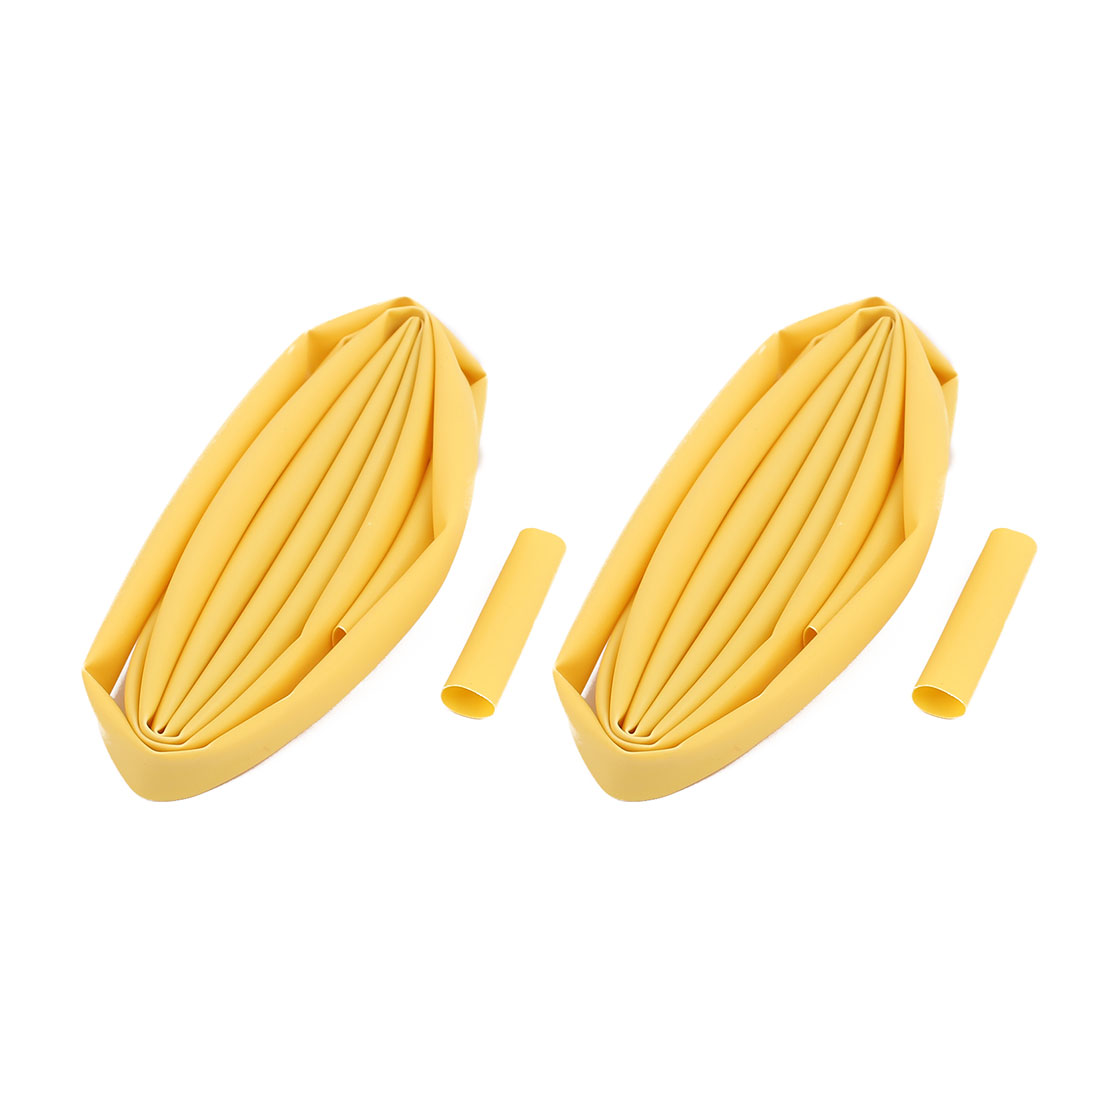 2Pcs 6mm Dia 2:1 Shrink Ratio Shrinkable Tube Heat Shrink Tubing Tube Sleeving Yellow 1M Length